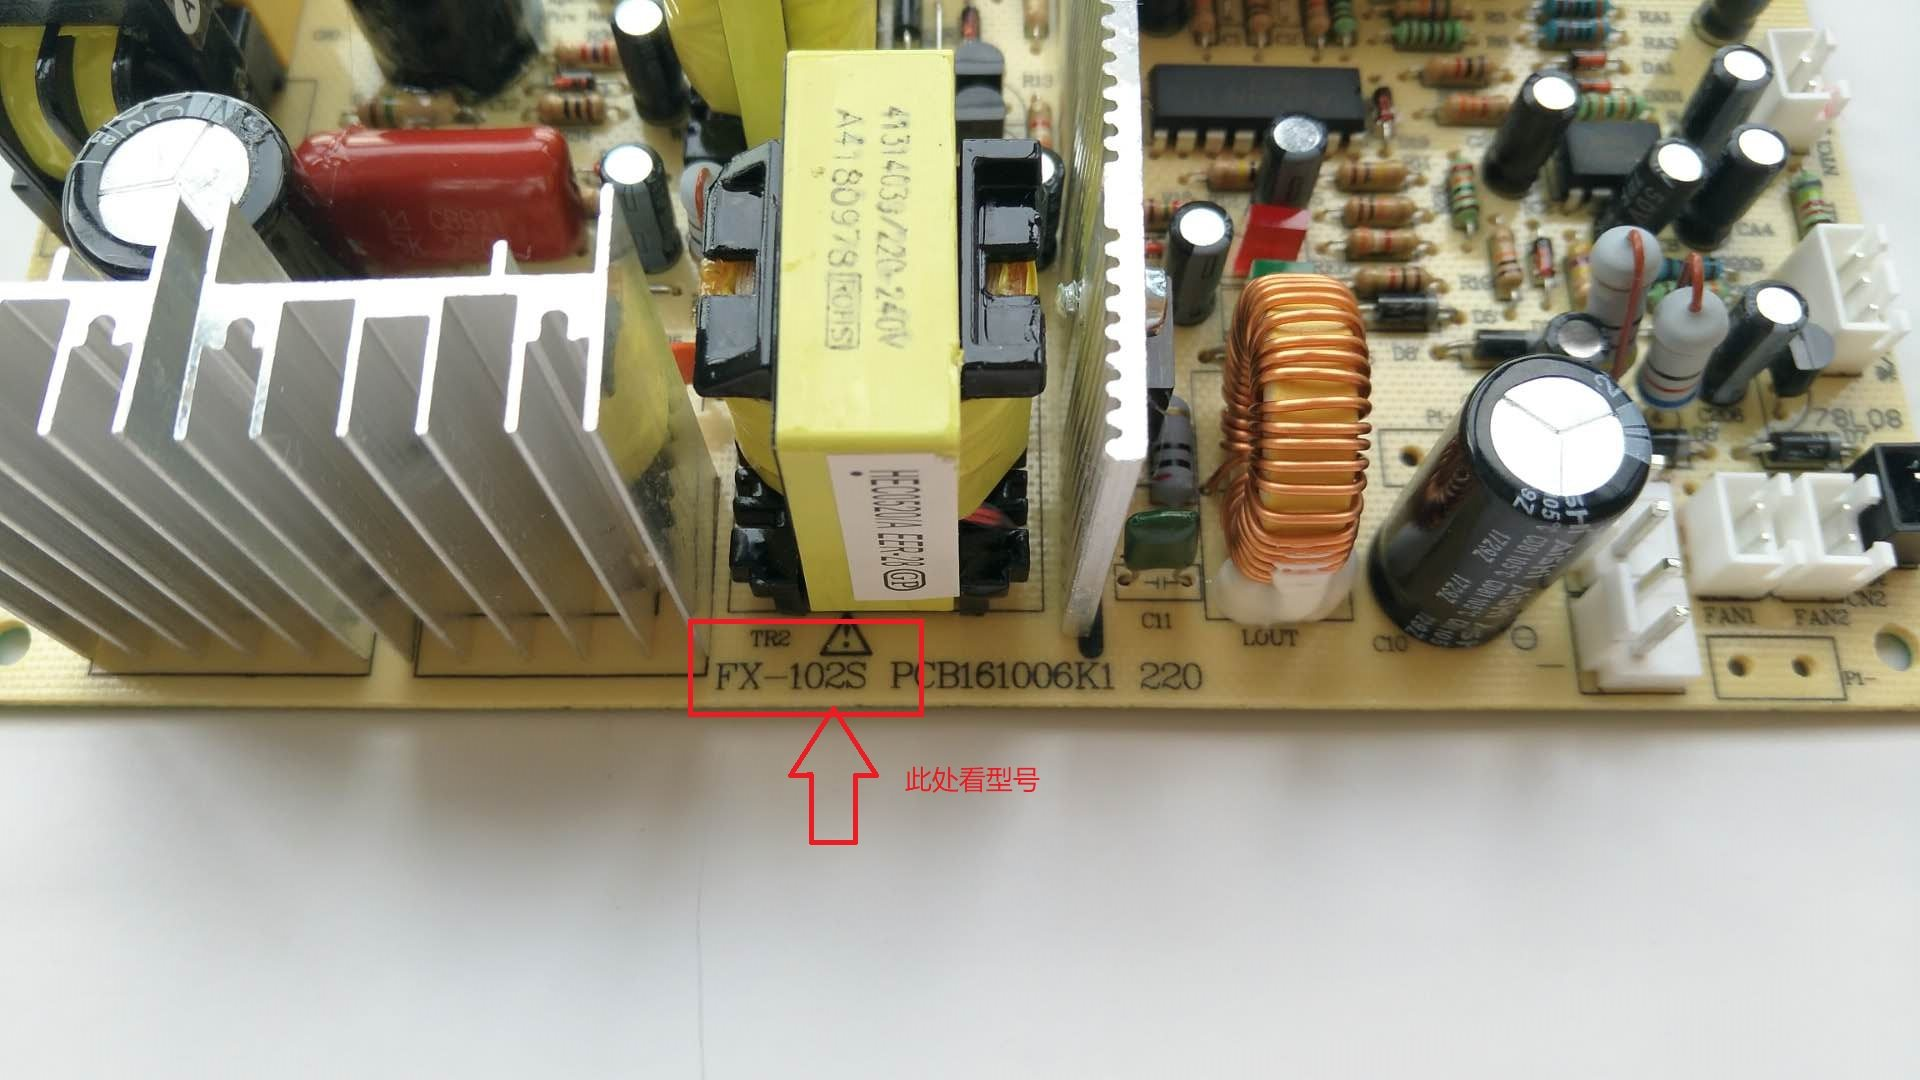 FX-102/FX-102S/ 10.5V/12.5V 50W/70W Wine cooler refrigerator freezer accessories power control board